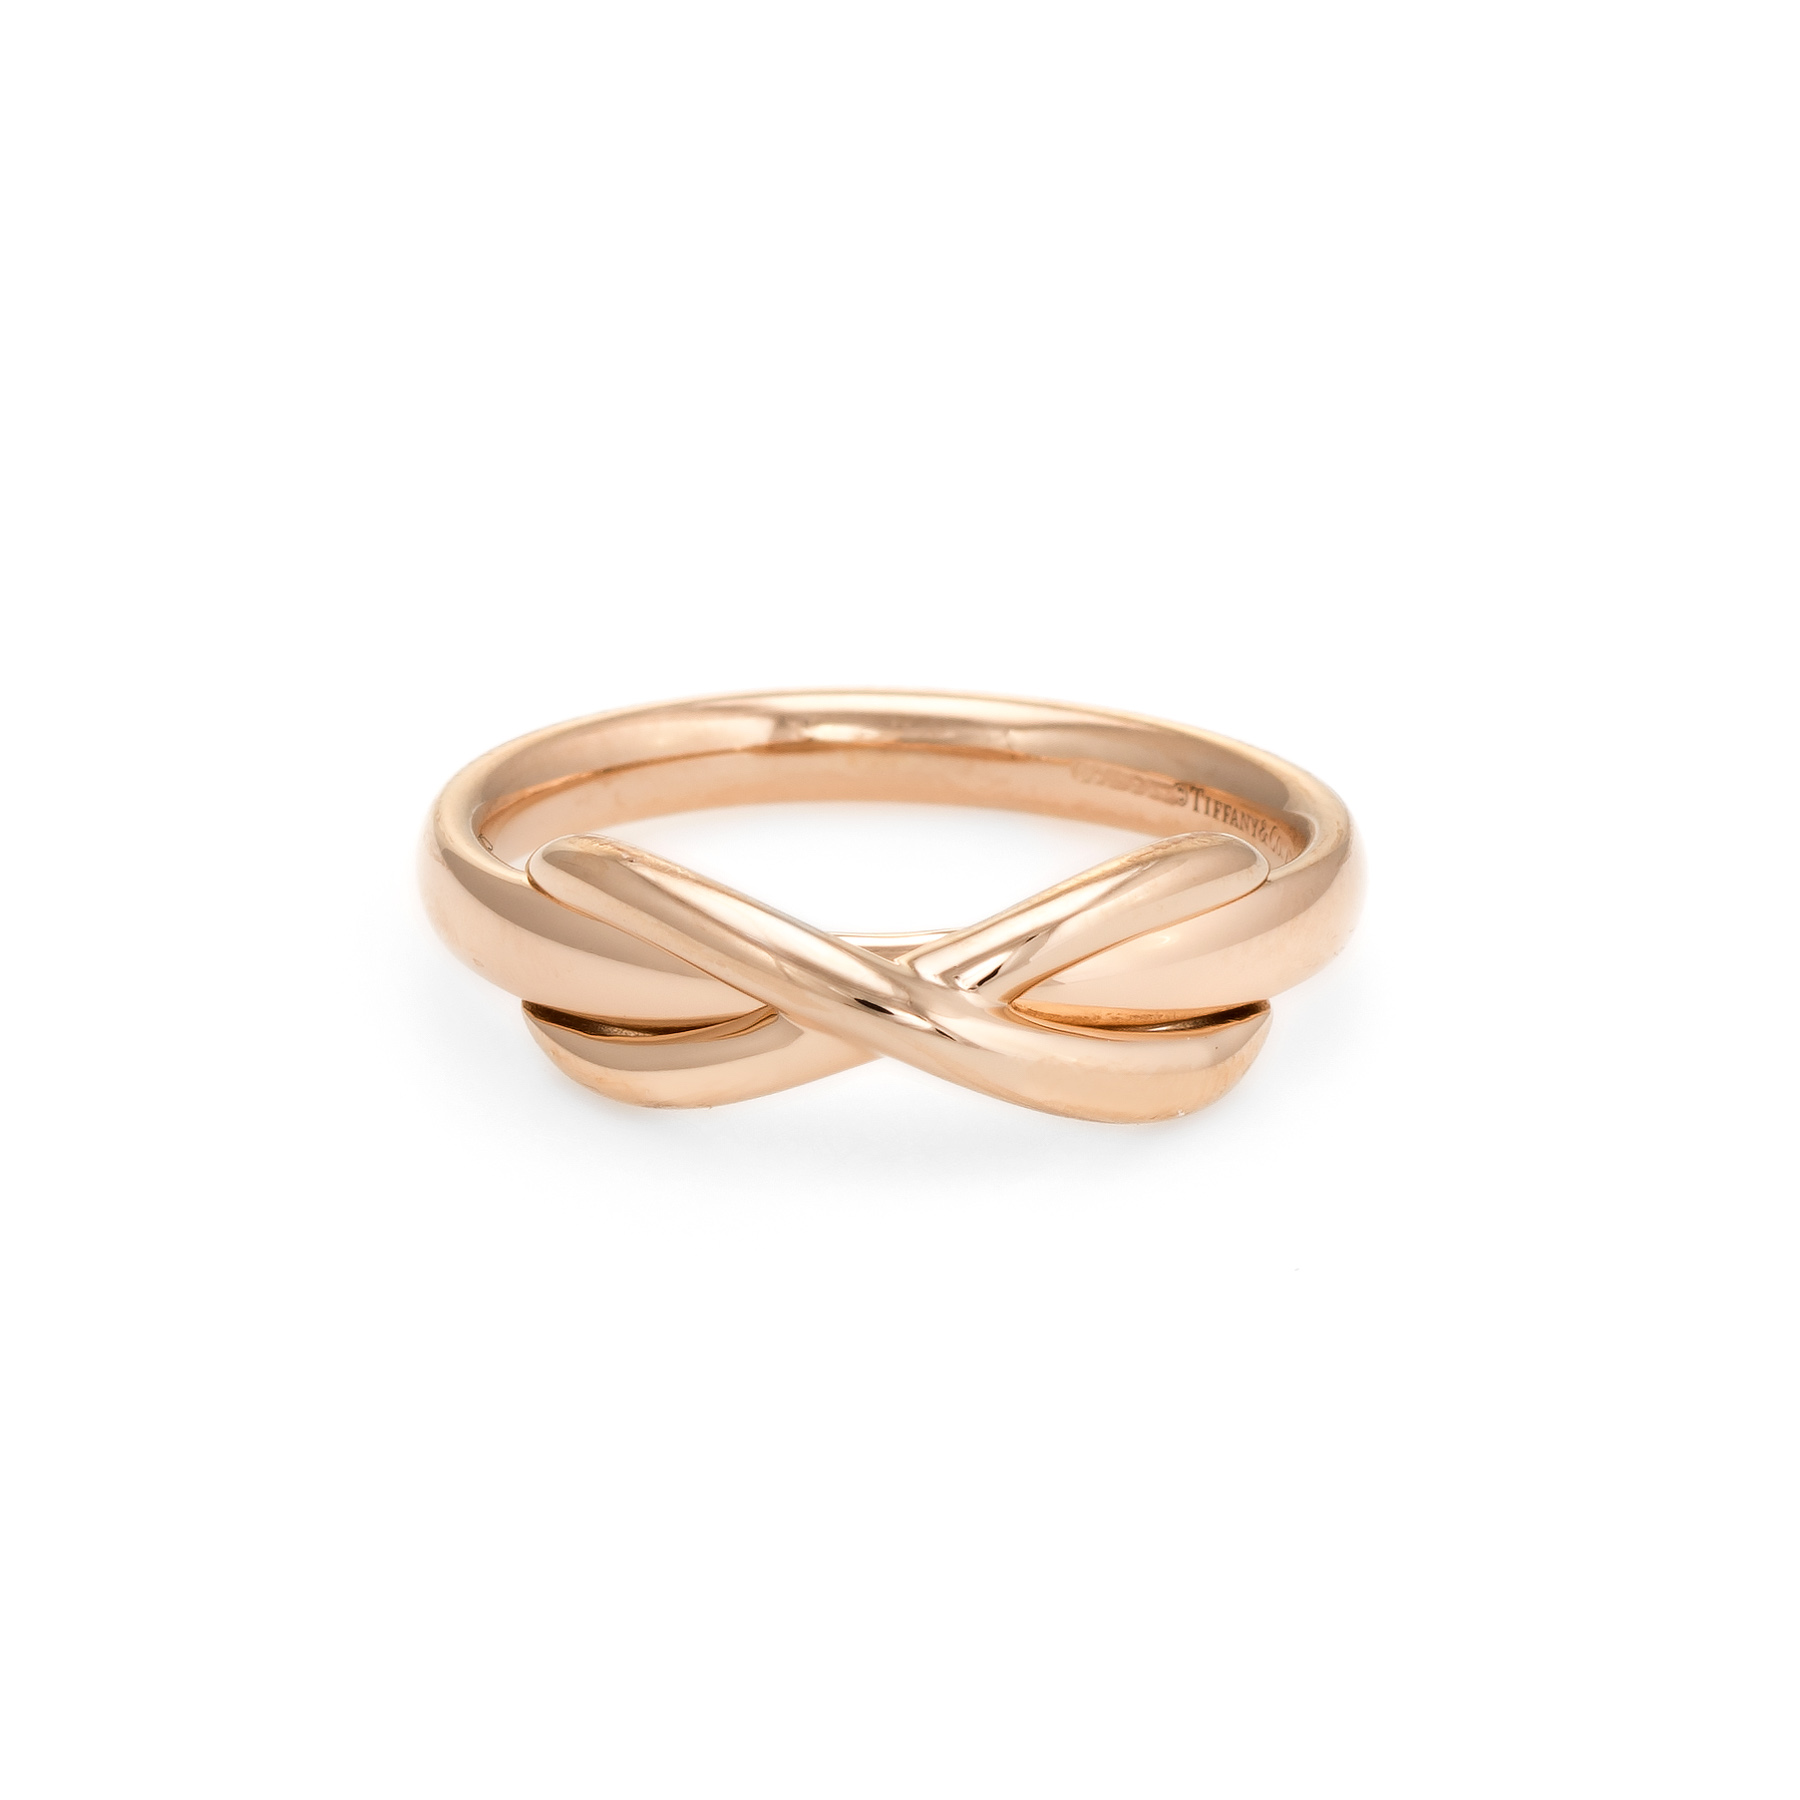 9abb351beba91 Details about Estate Tiffany & Co Infinity Ring 18k Rose Gold Sz 6 Designer  Jewelry